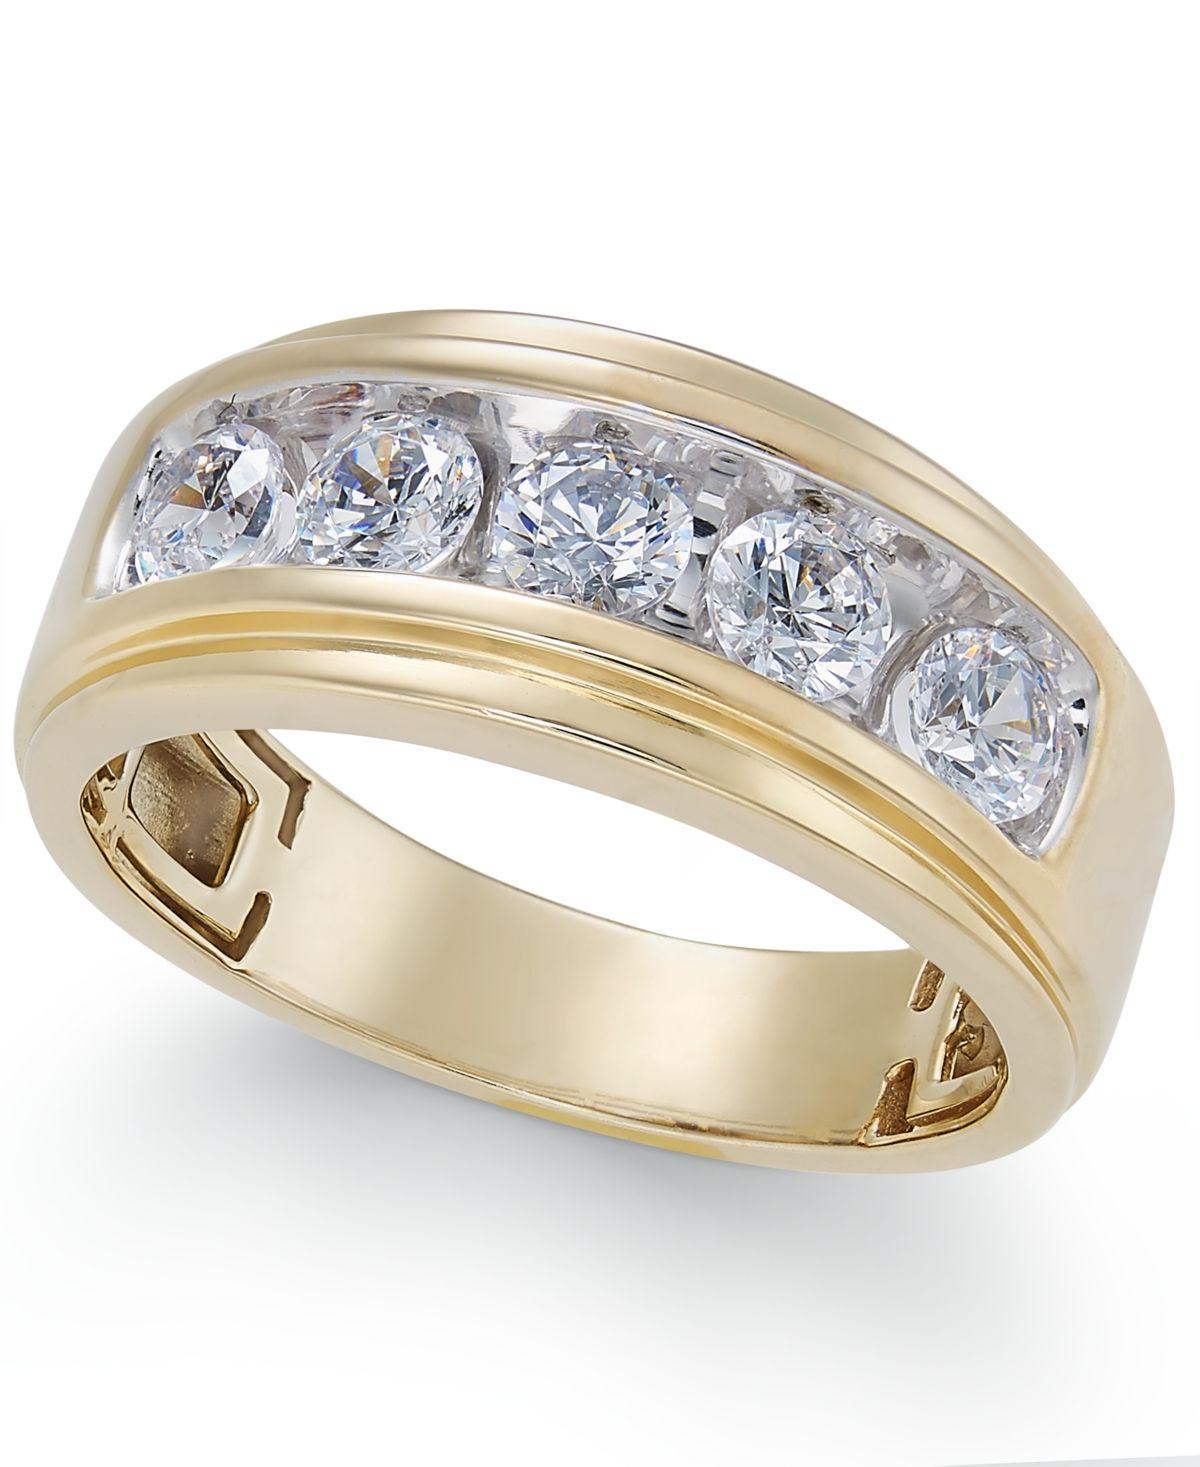 Macy's Men's Diamond FiveStone Ring (11/2 ct. t.w.) in